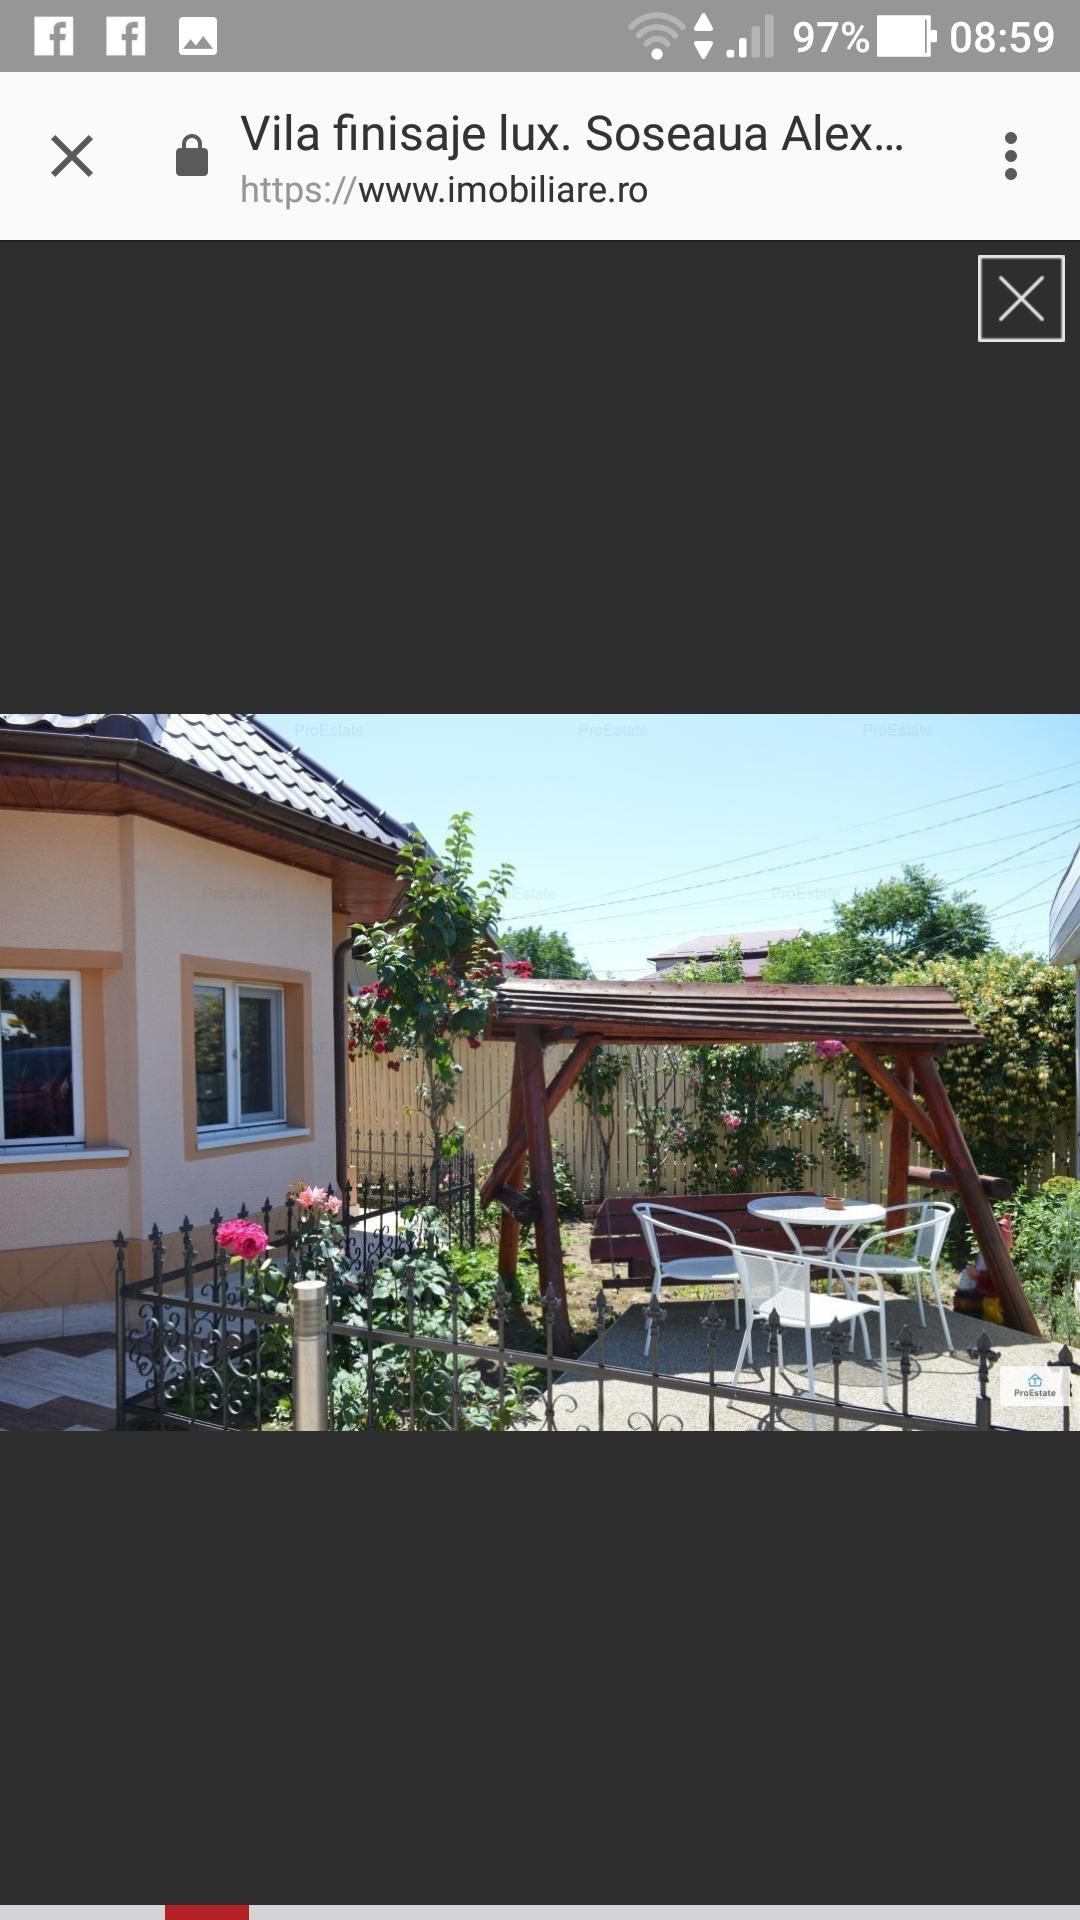 Vendita villa bucharest bucharest romania sos alexandria nr 187 - Agenzie immobiliari bucarest ...